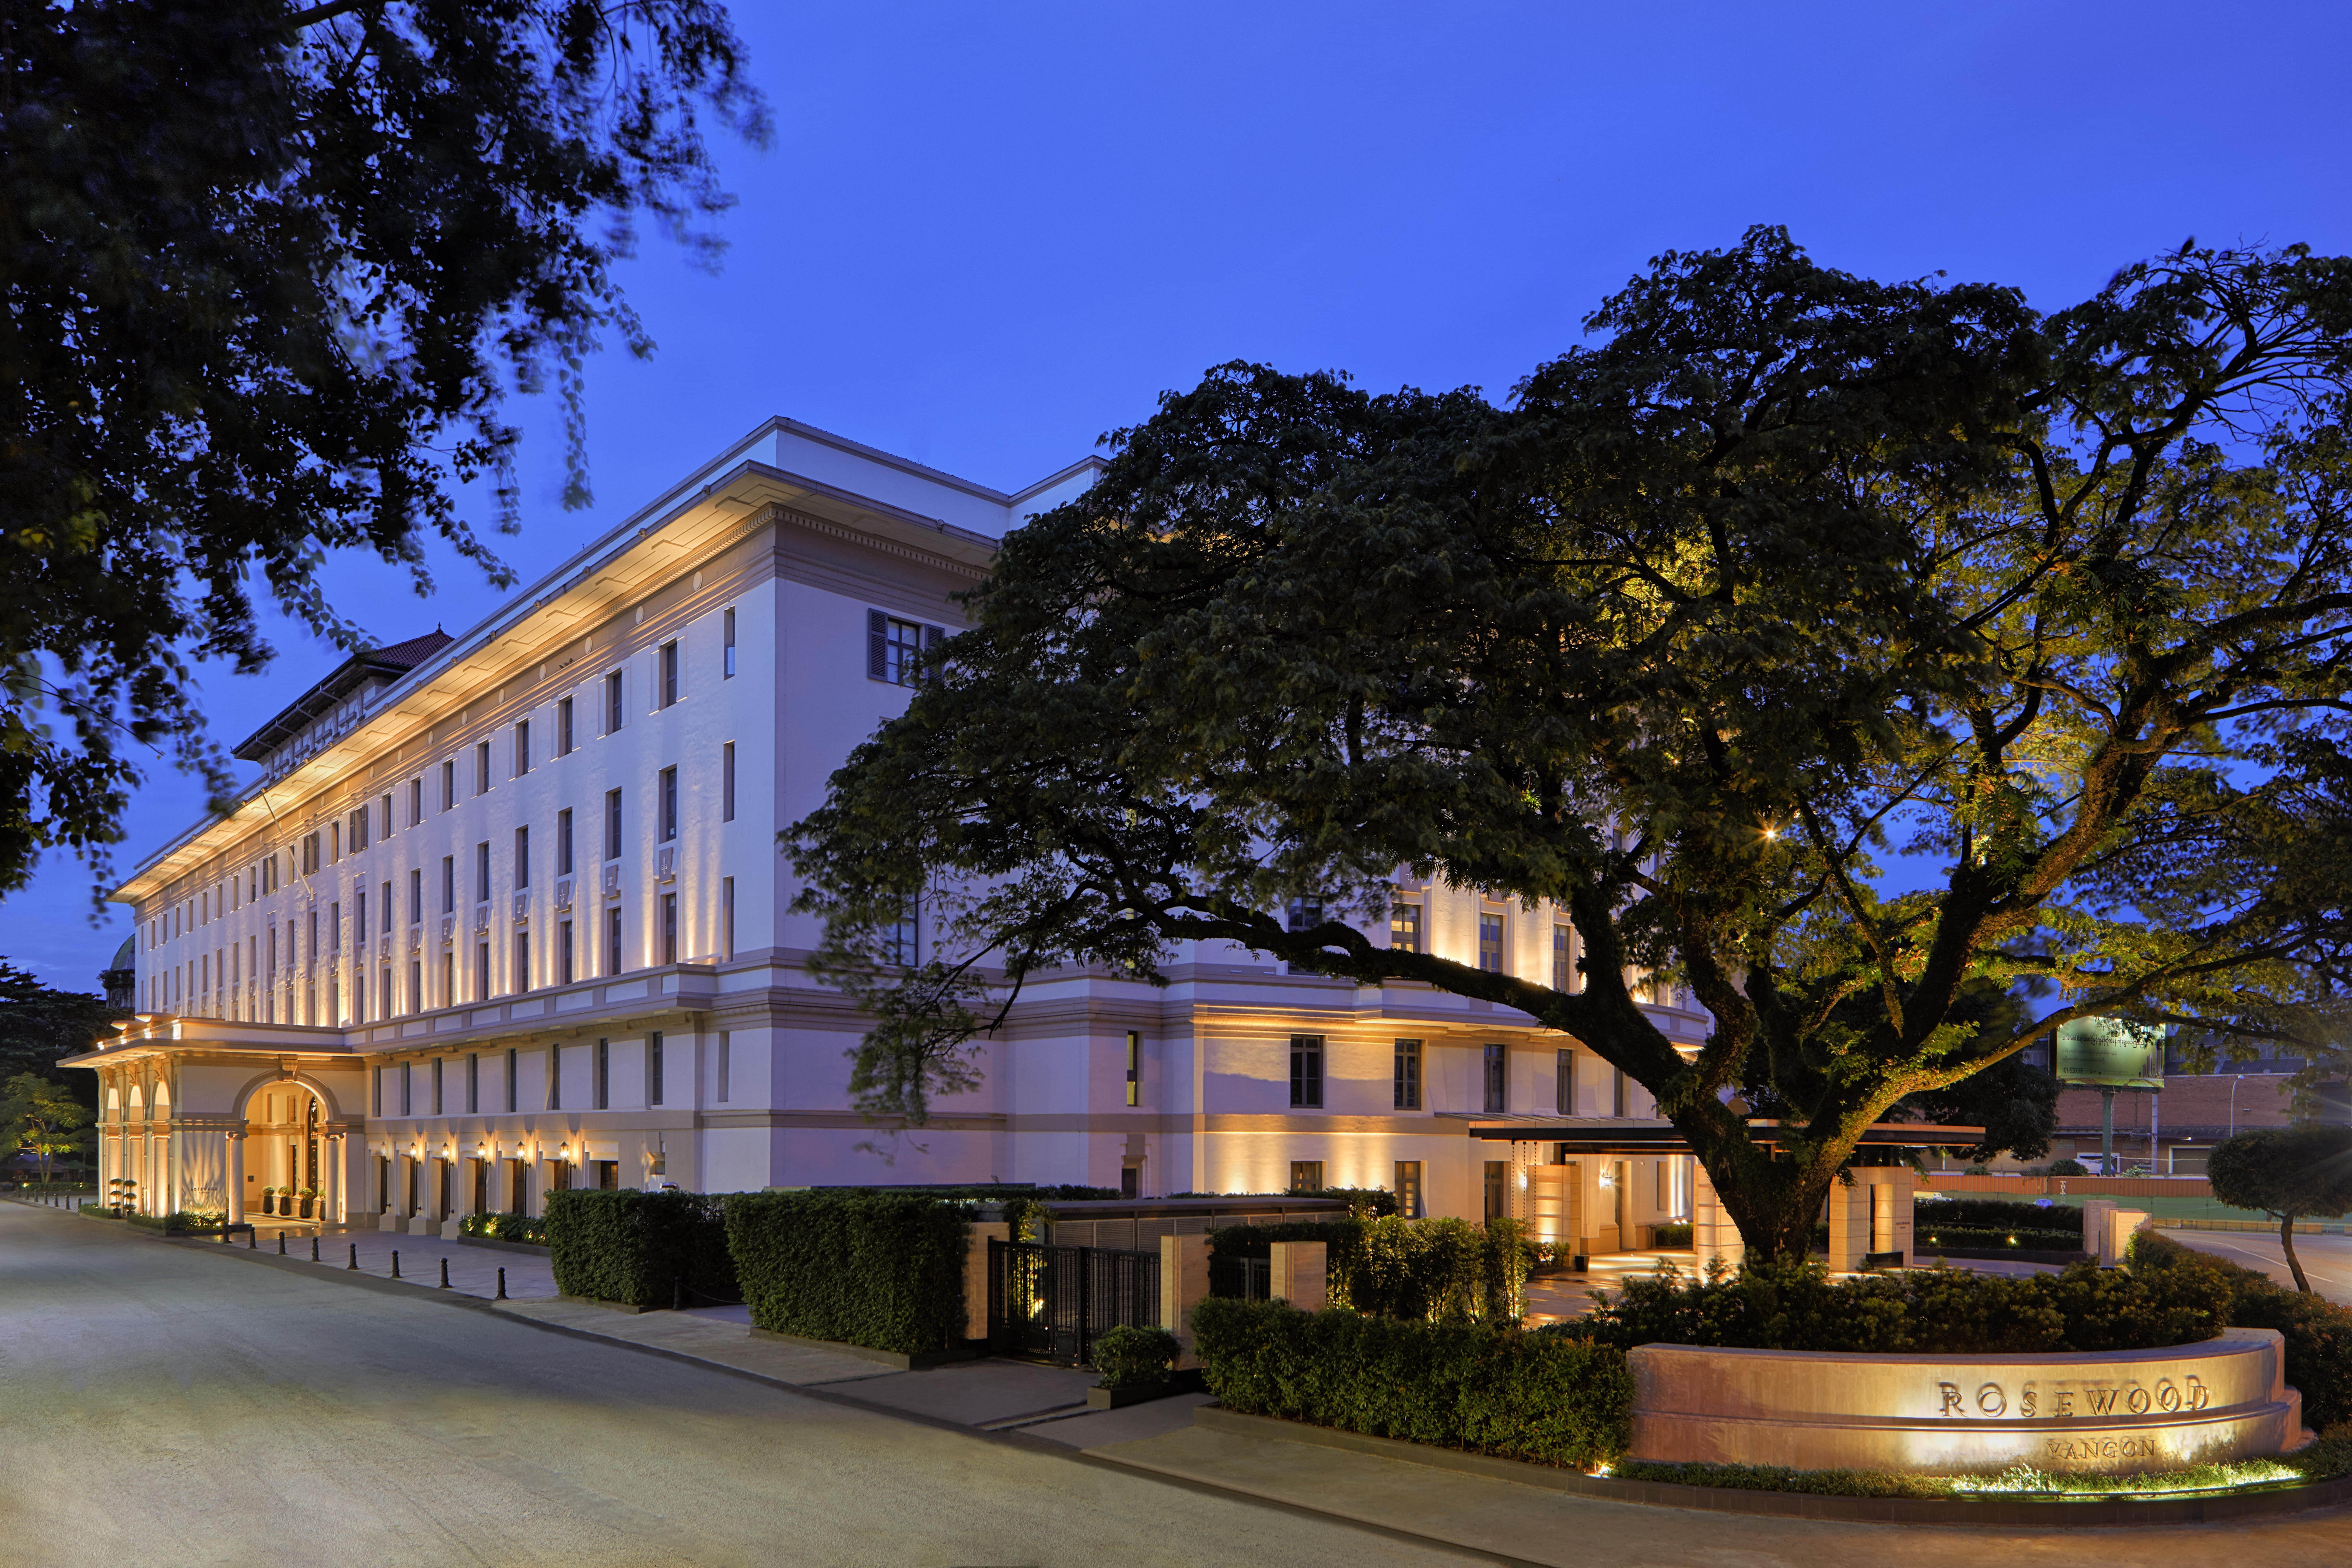 Rosewood Yangoon, Rosewood in Myanmar, Rosewood Hotels, New Law Courts, Enchanting Yangon, travel to Myanmar, best hotels Myanmar,